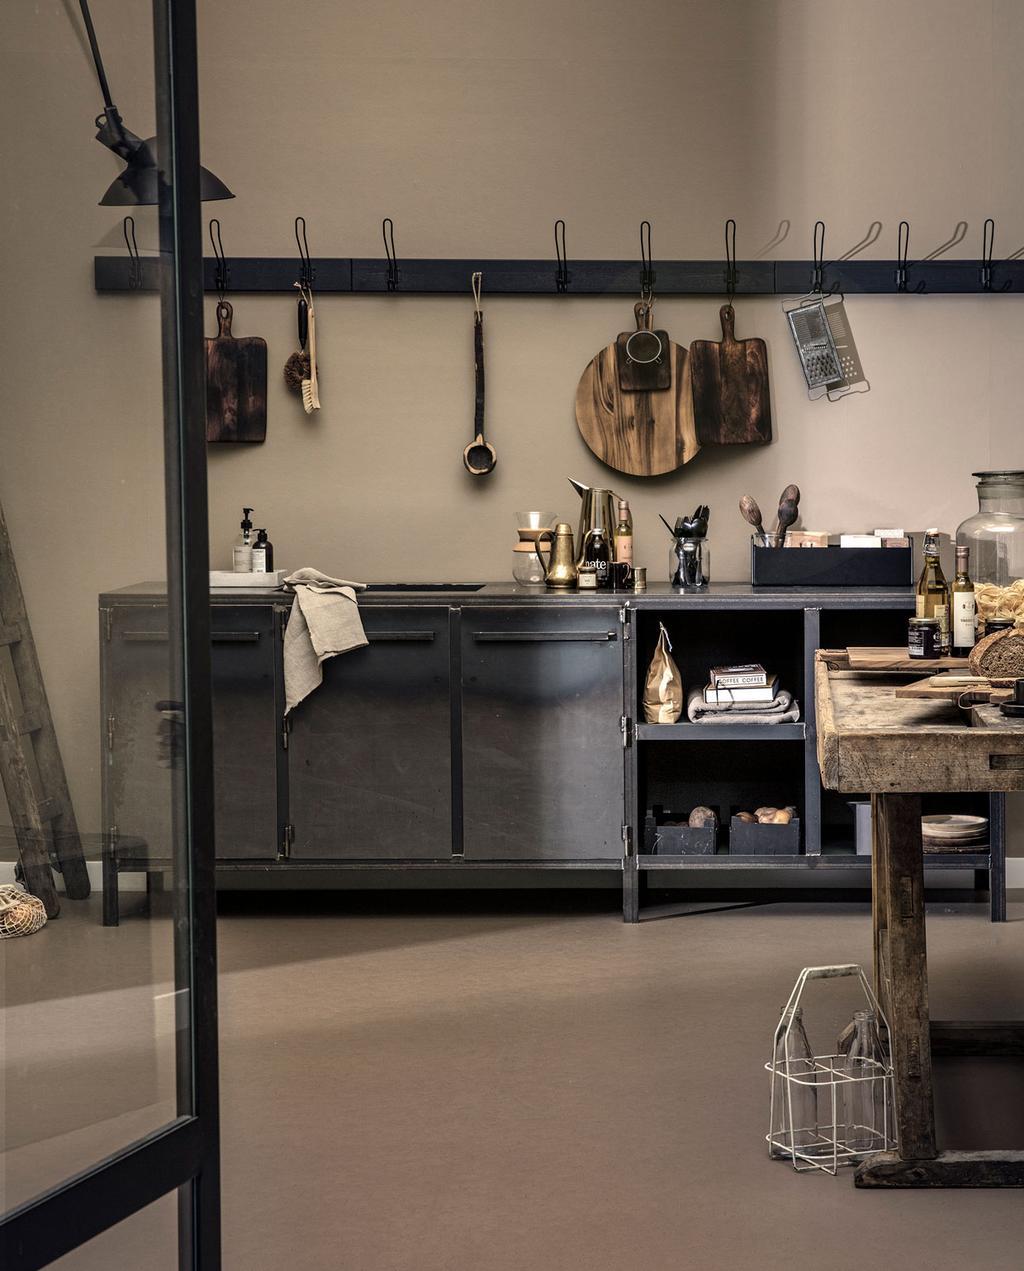 bruine keuken met forbo vloer